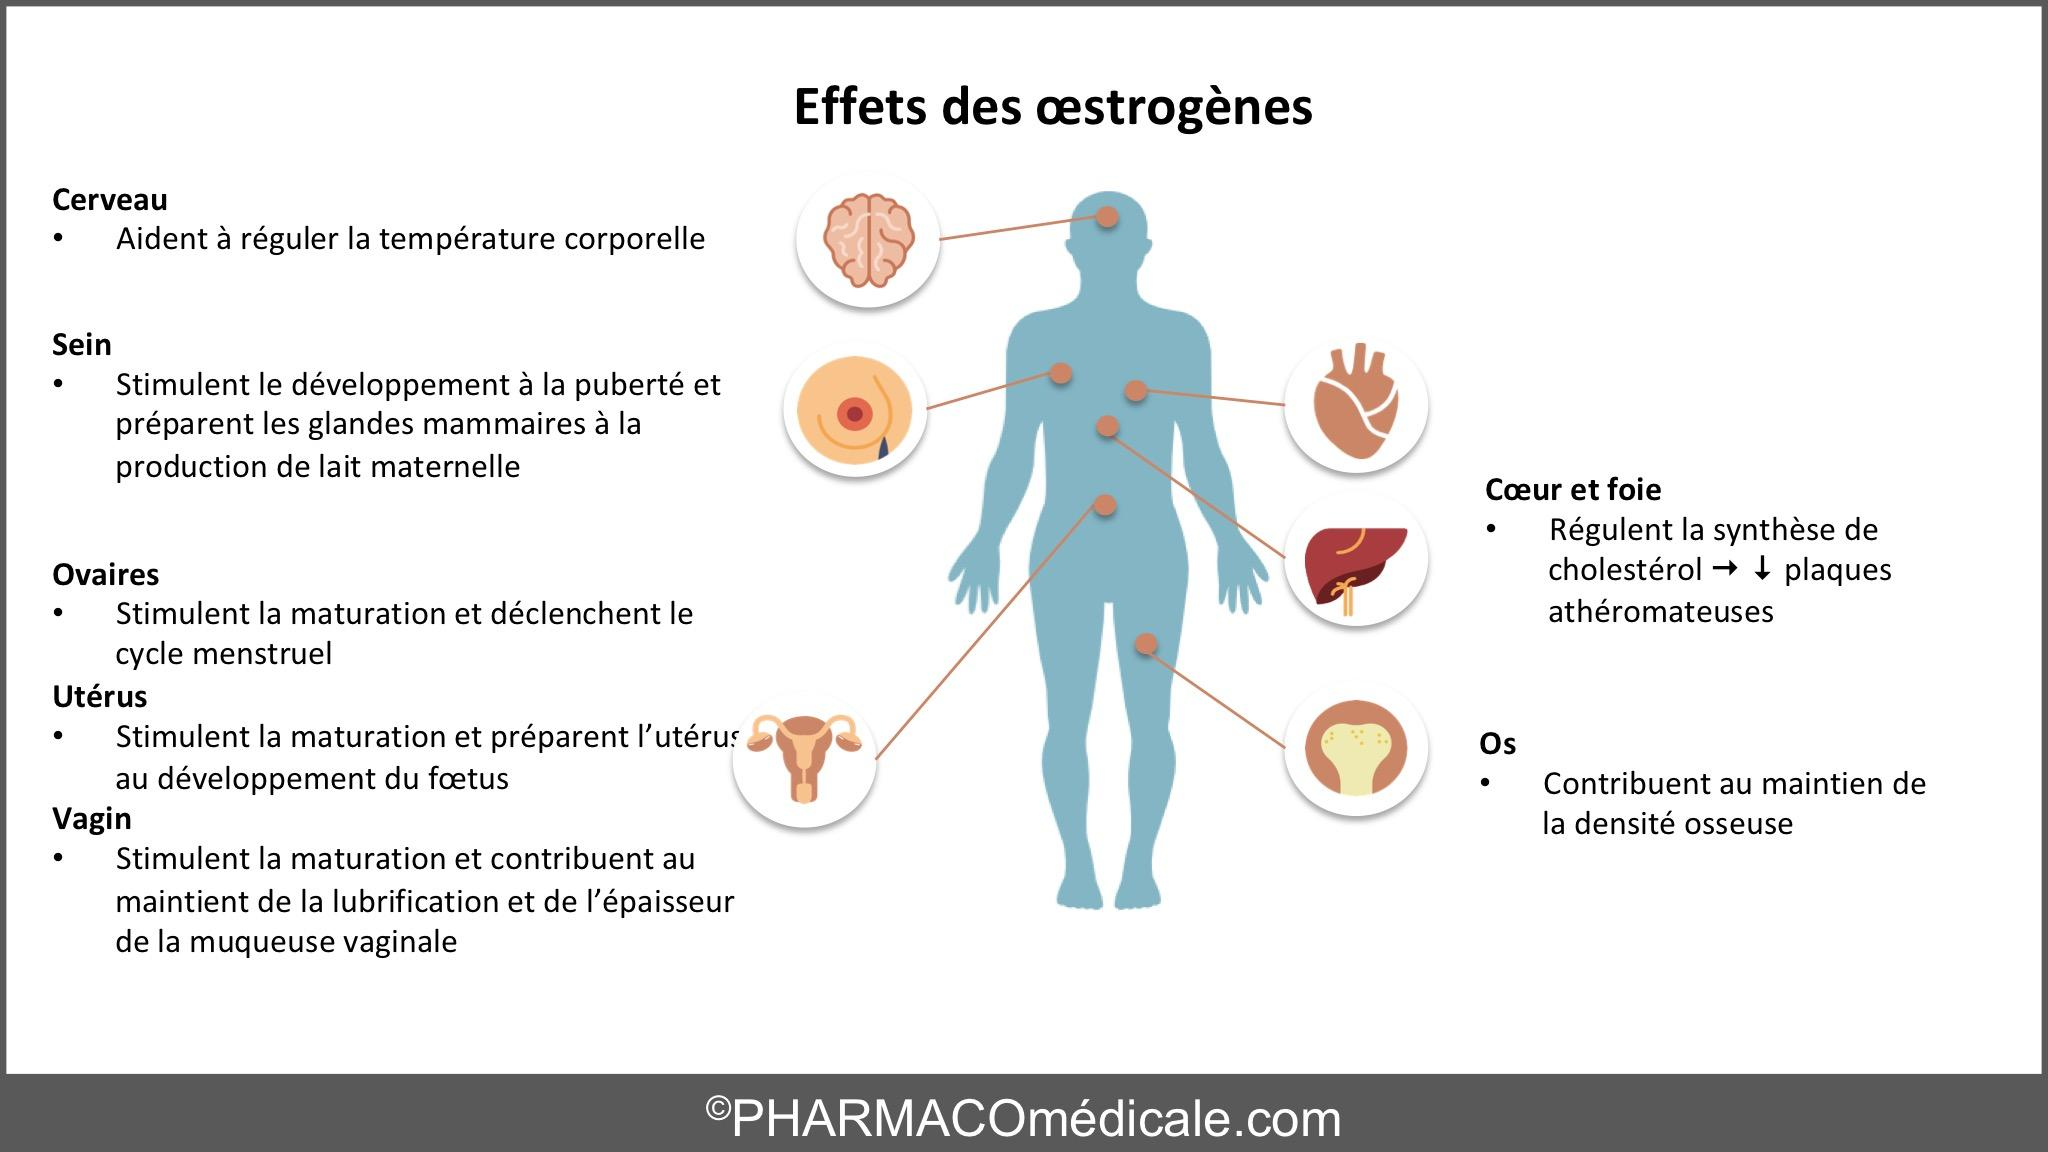 oestrogènes effets secondaires